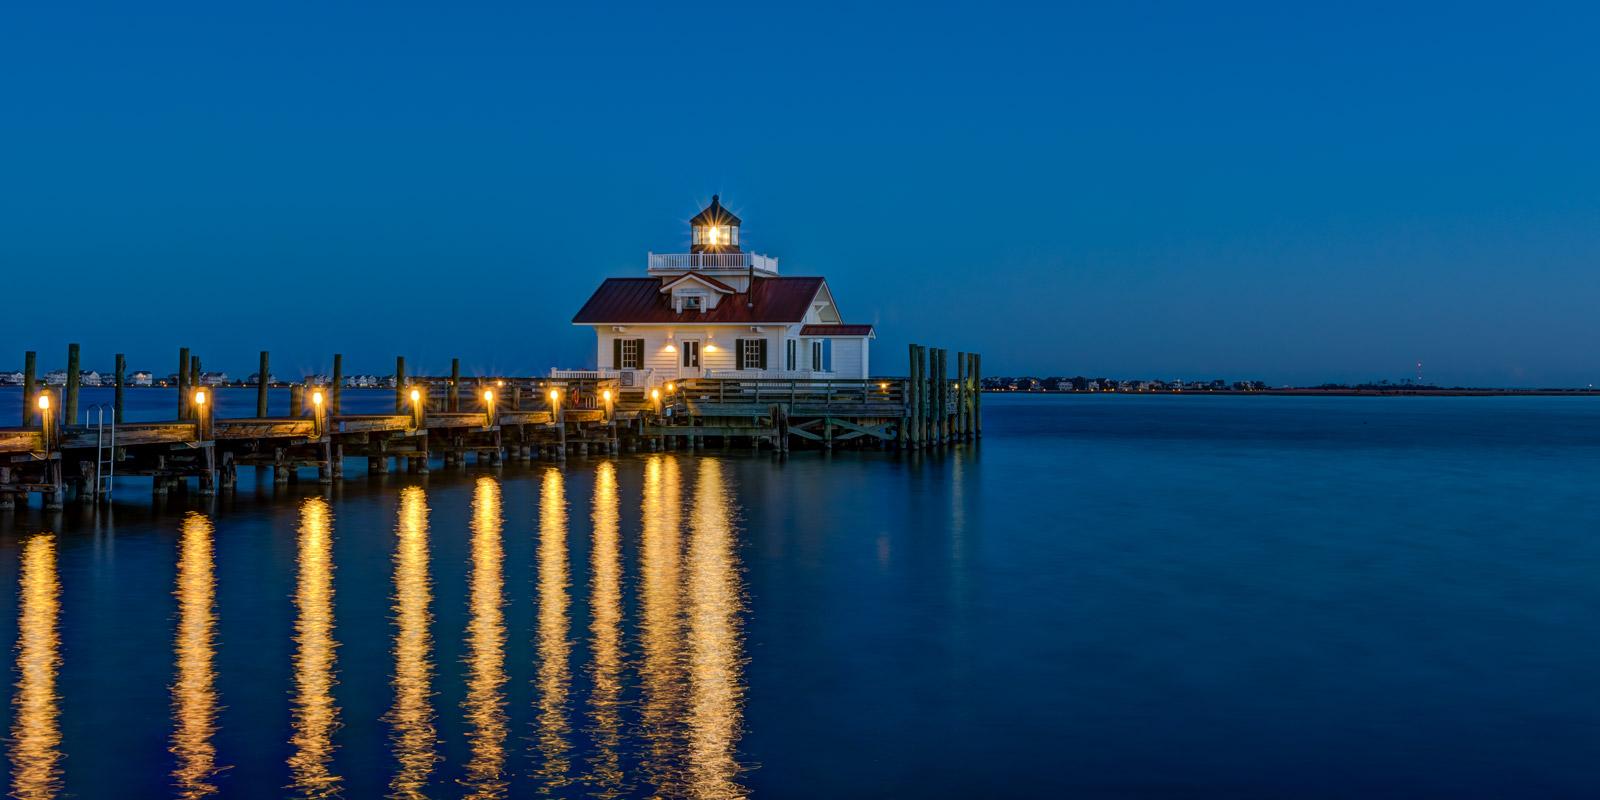 North Carolina, Manteo, lighthouse, limited edition, photograph, fine art, landscape, coast, photo